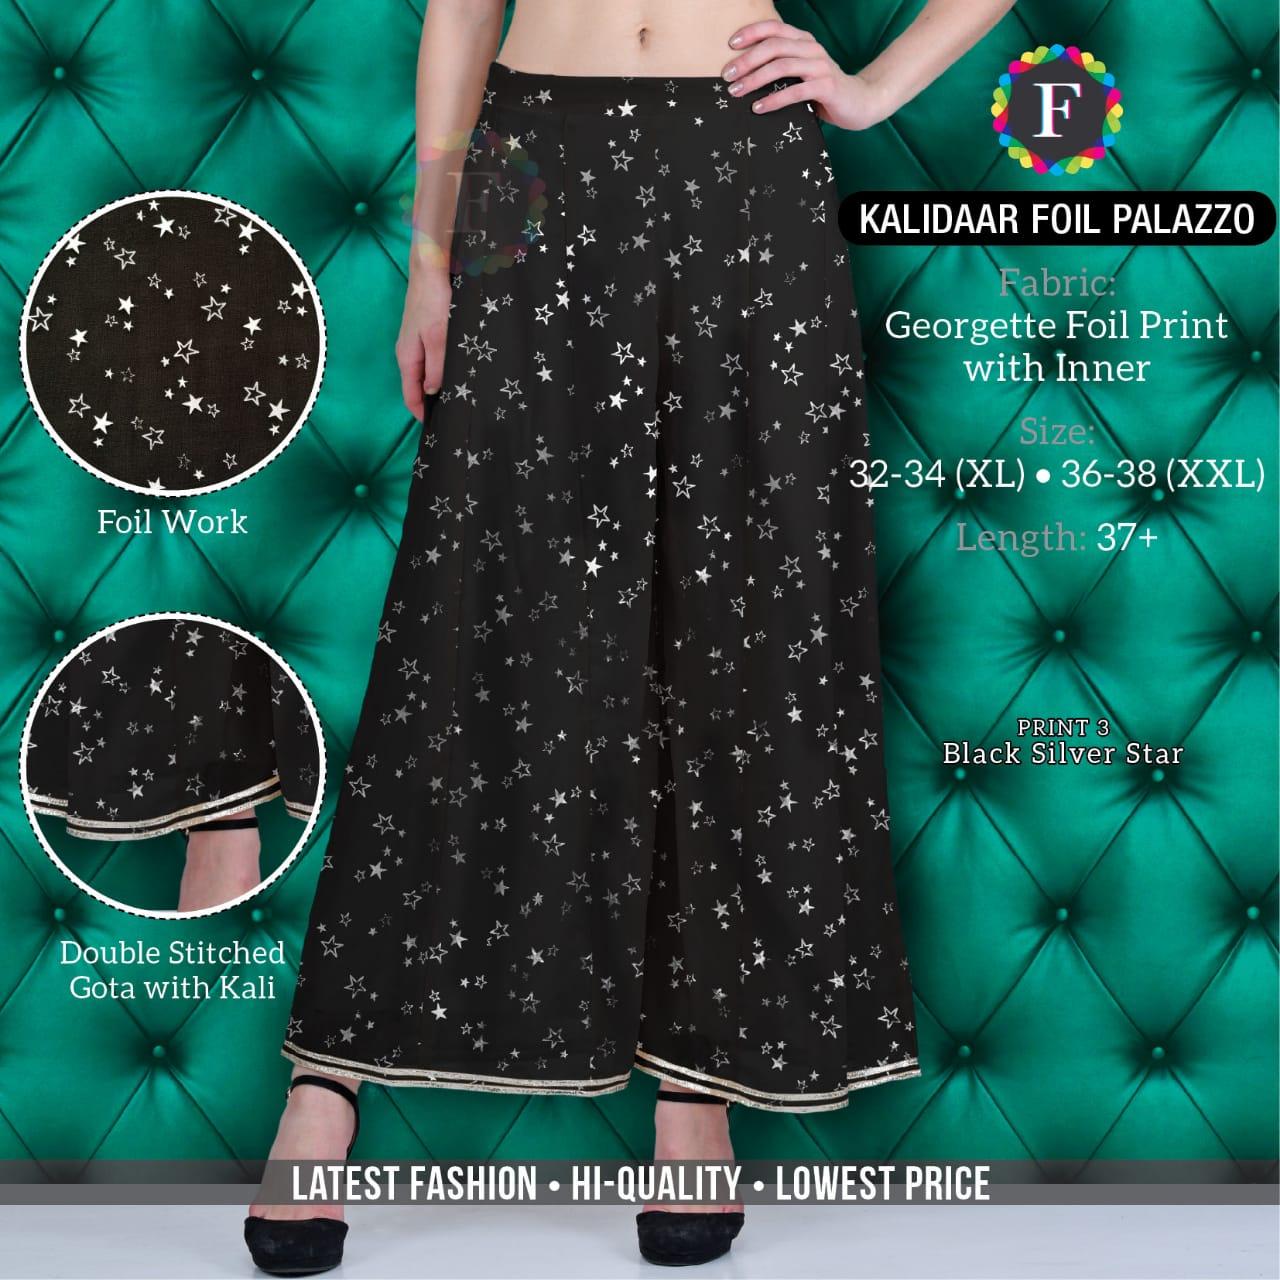 Kalidaar Foil Palazzo Multi Colored Bottom Wear Plazzo Collection